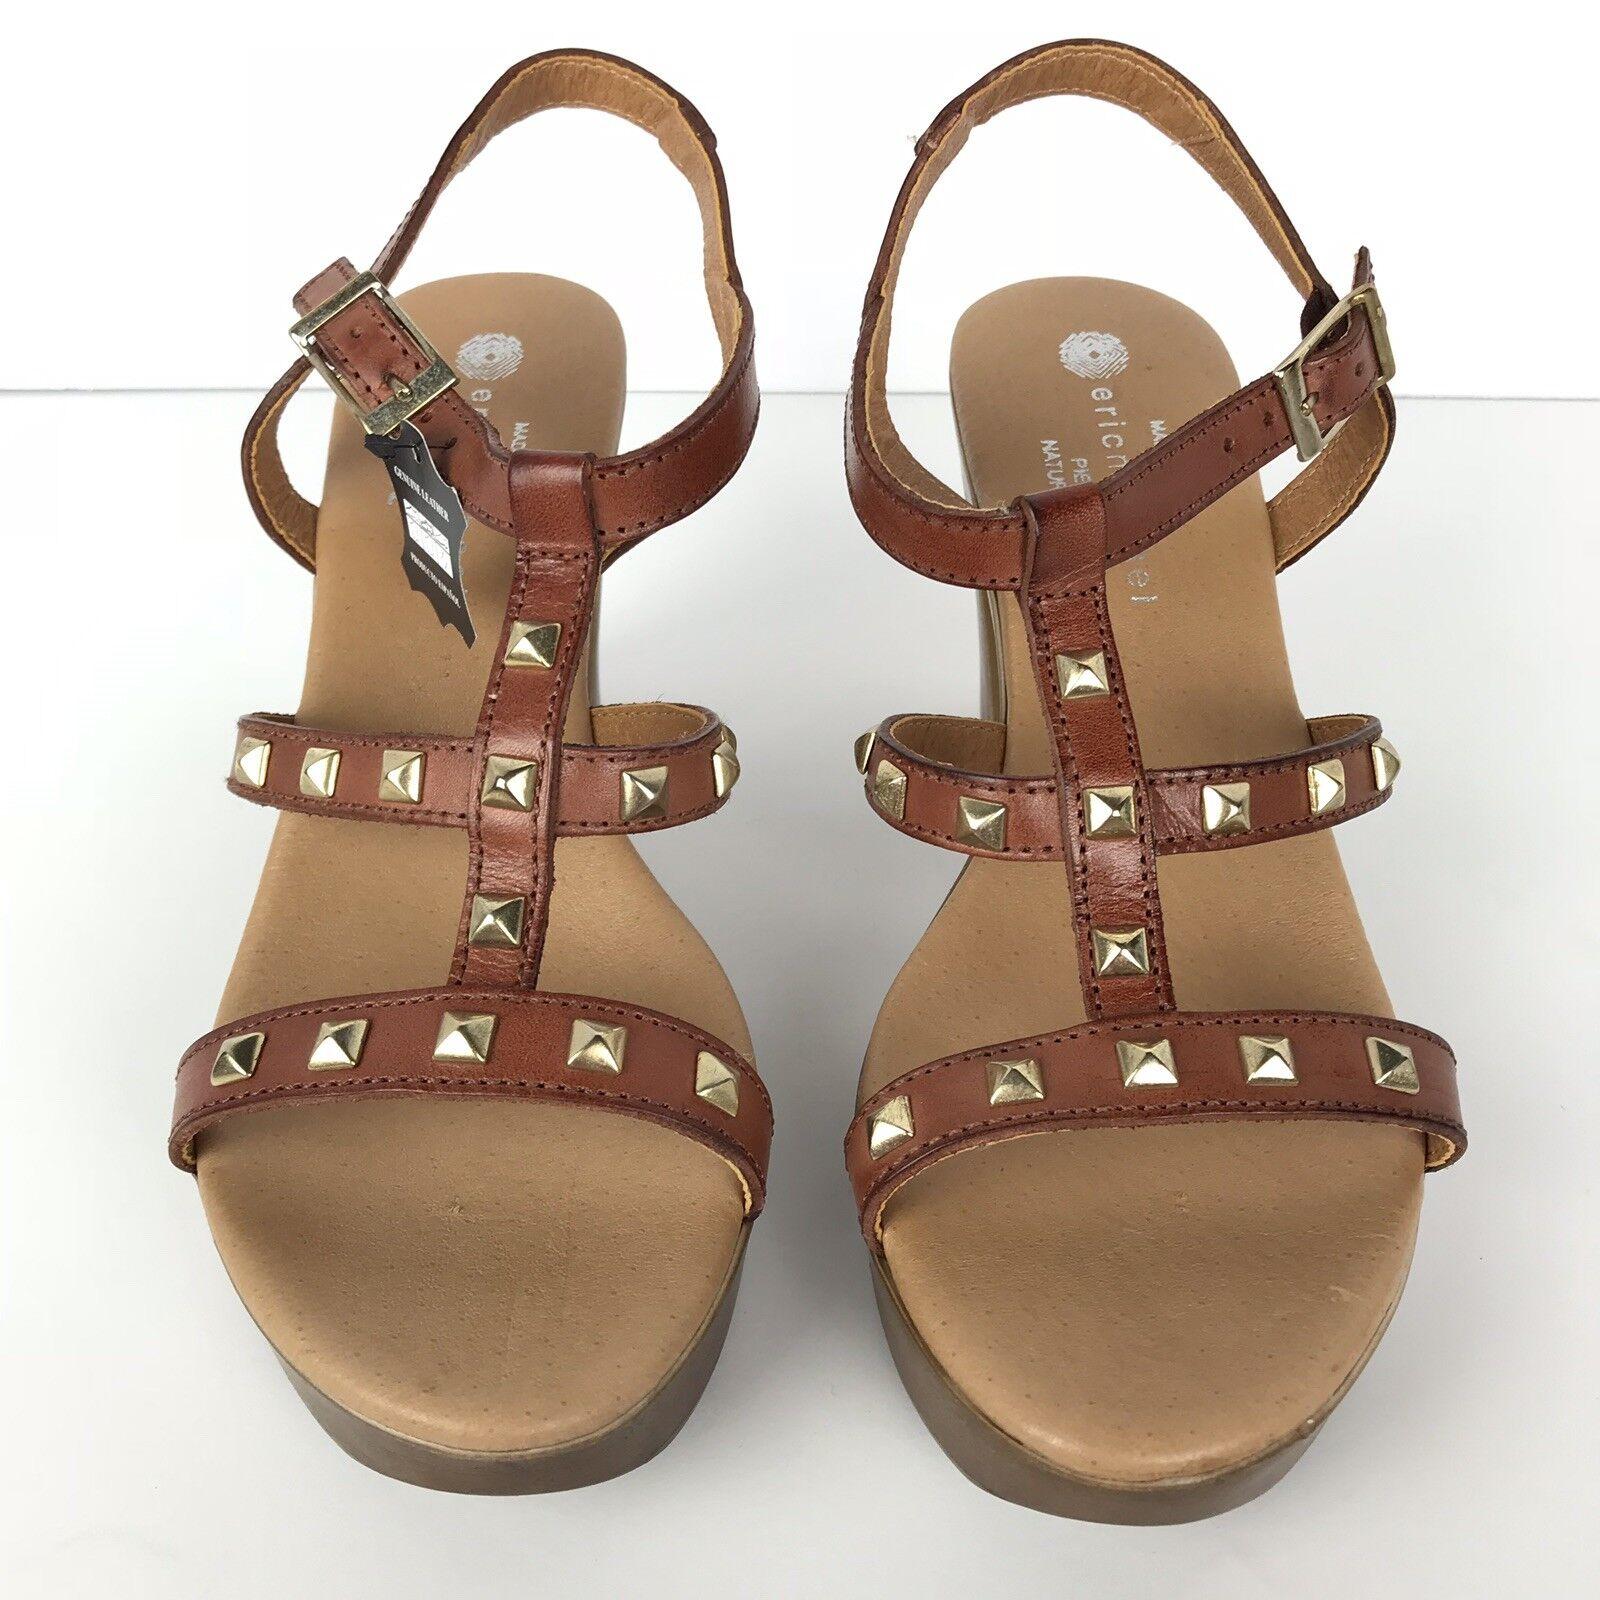 Eric Michael Damens's Open Toe Slingback Sandales Sandales Sandales US Größe 9.5 EUR 40 Braun Leder ed66c5